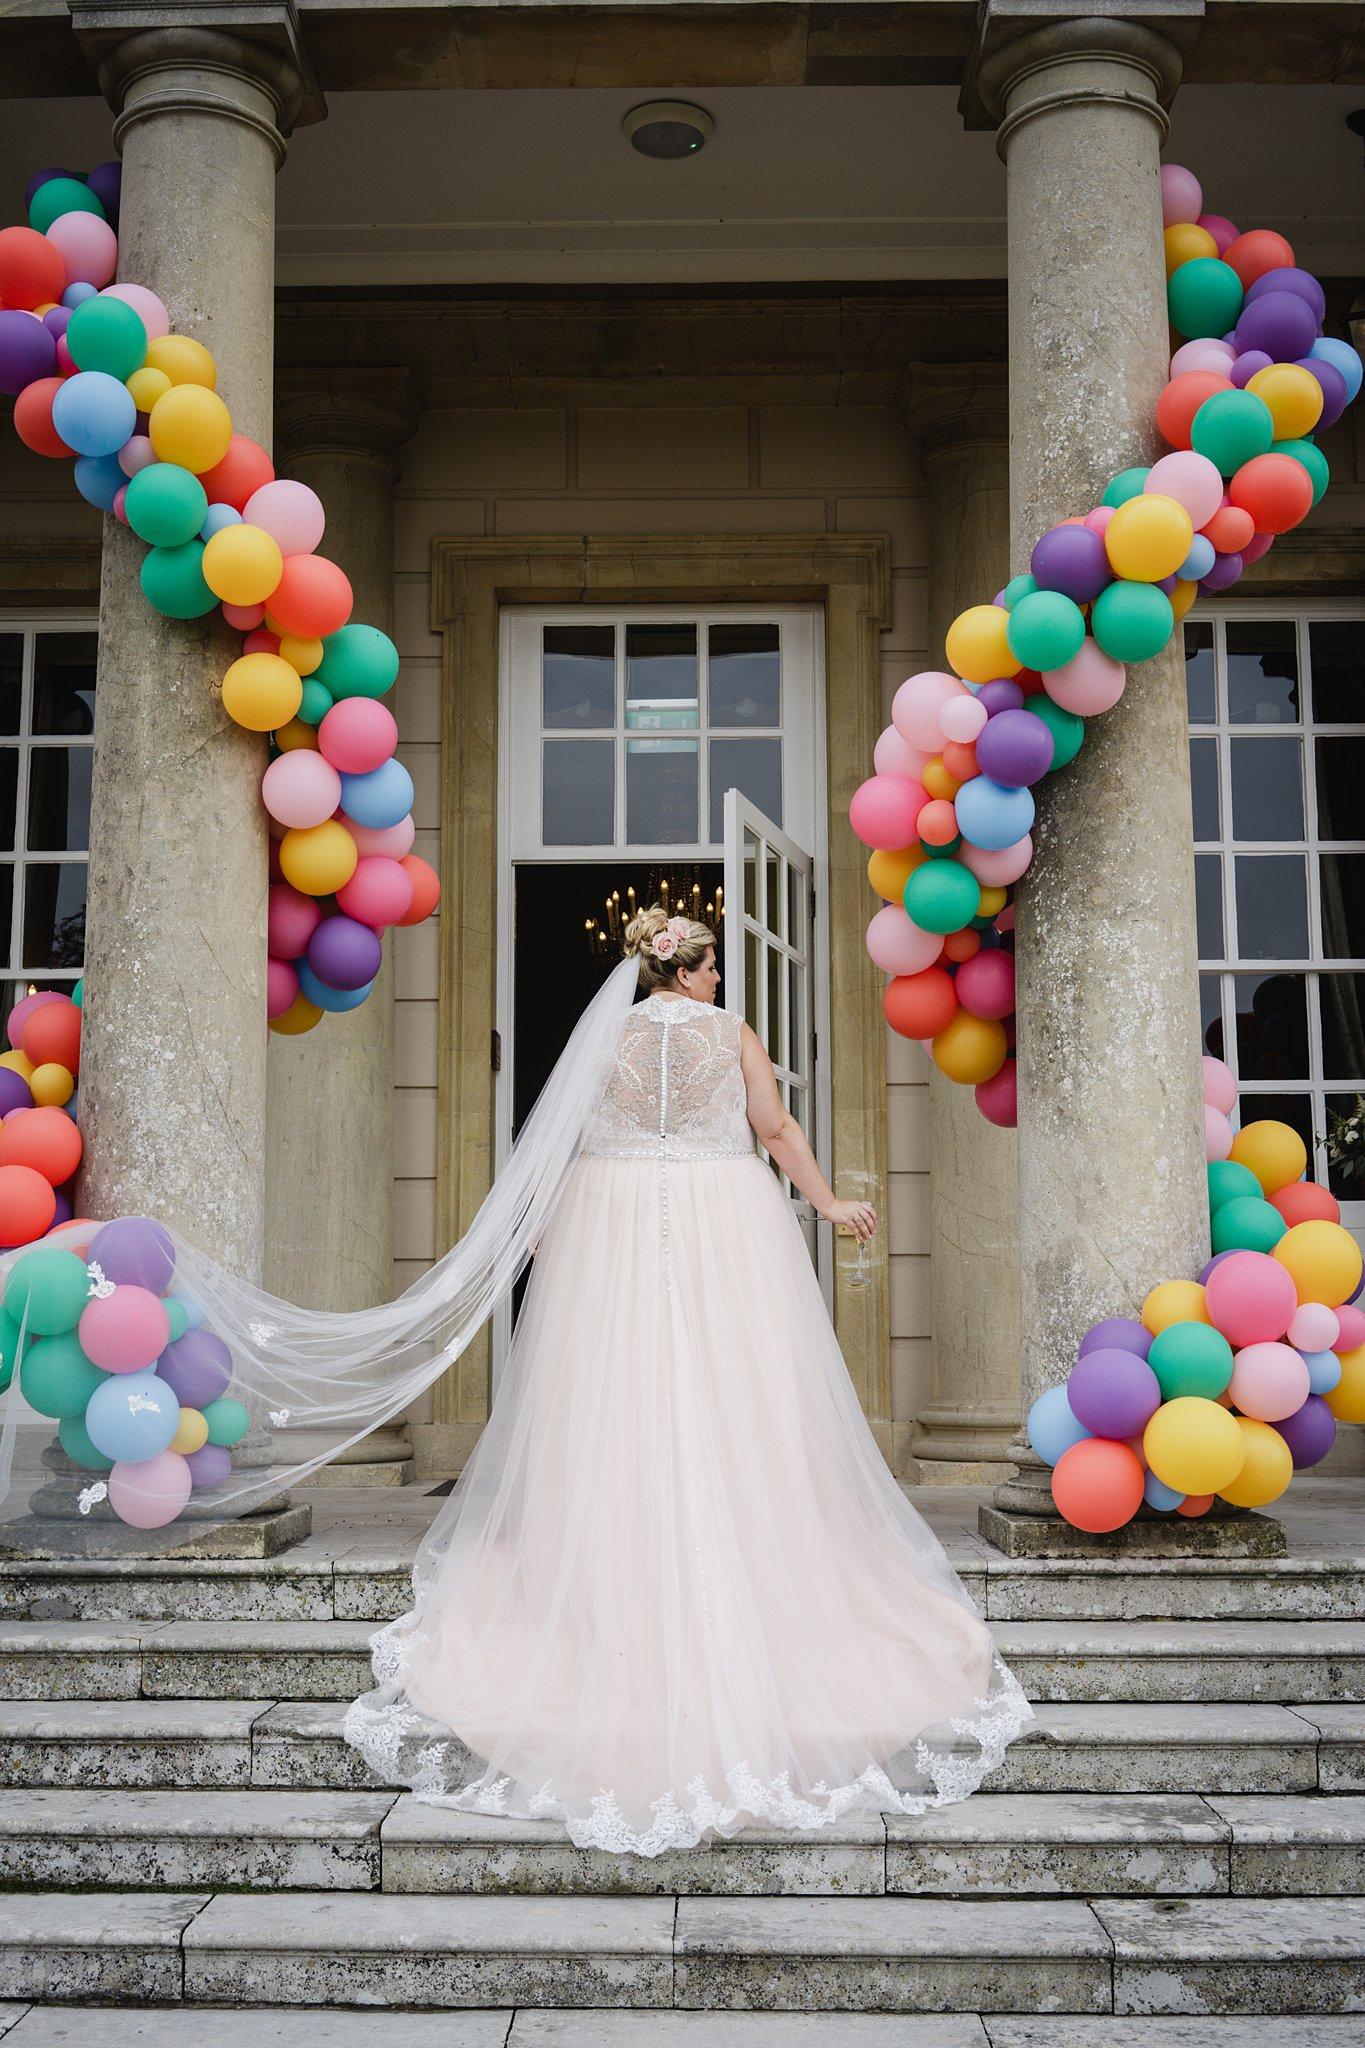 Bubblegum Balloons Wedding Decor, Buxted Park bridal portrait